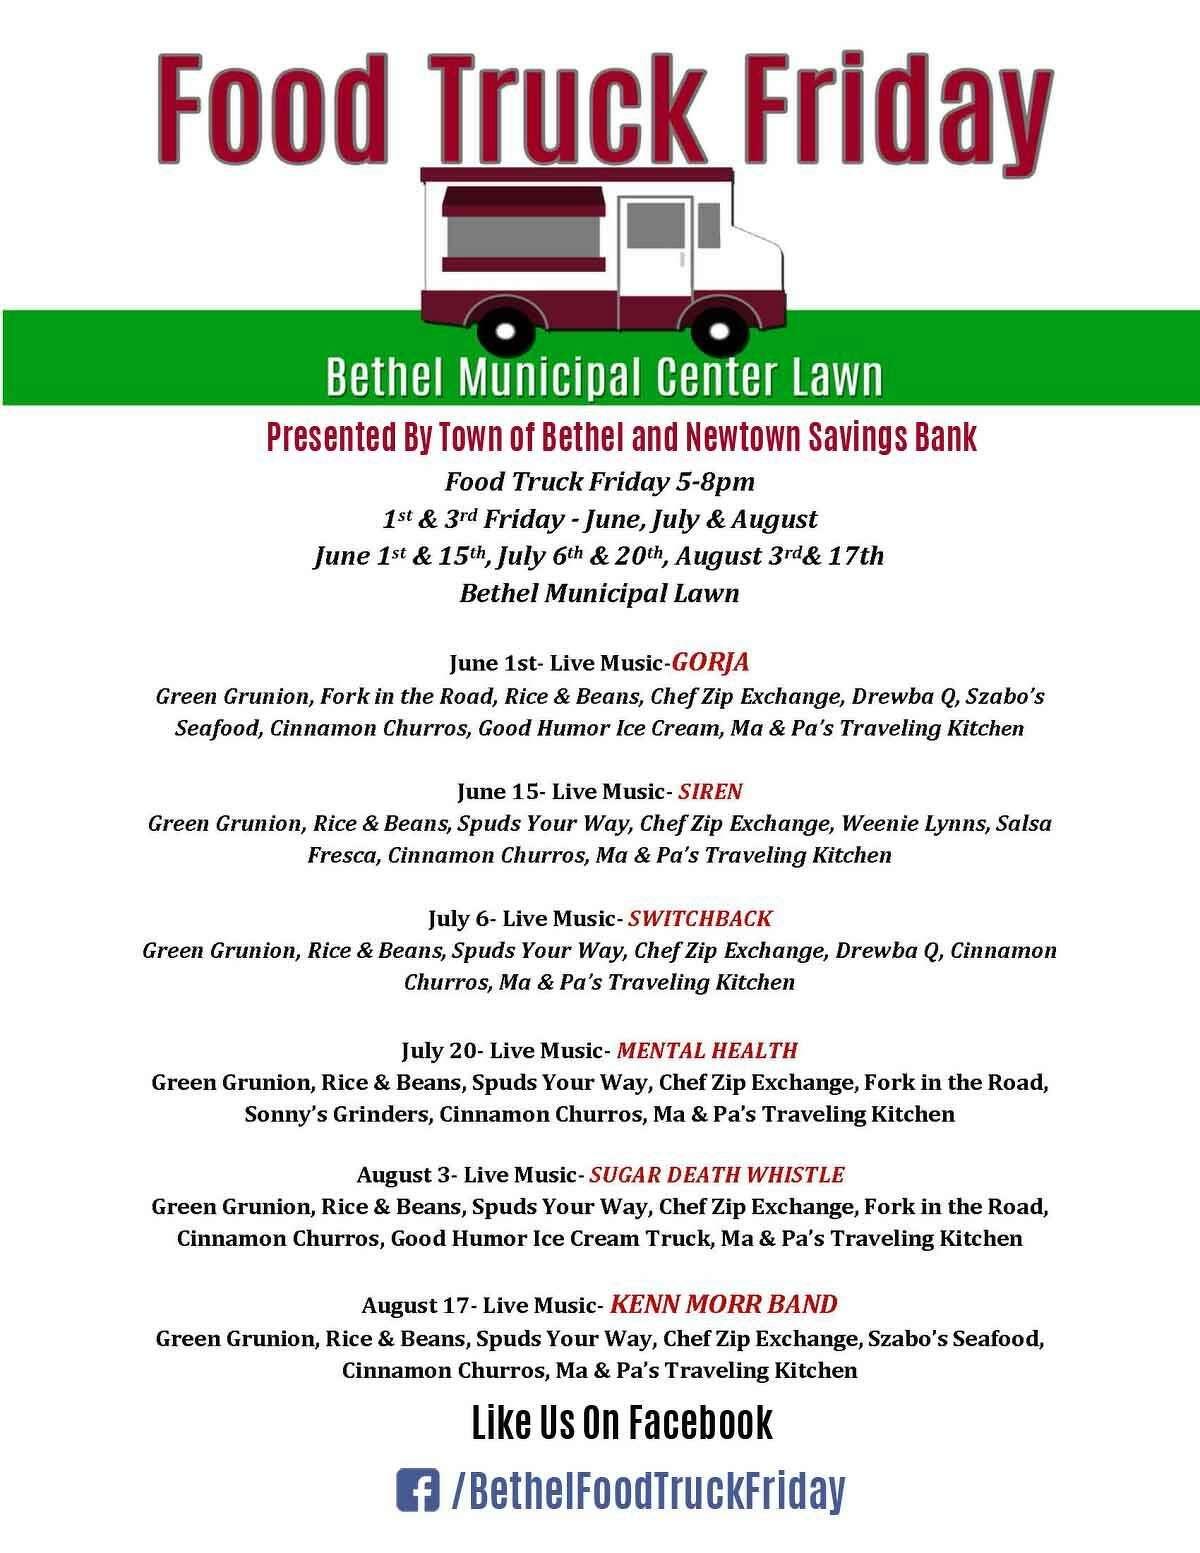 Bethel S Food Truck Friday Returns This Week